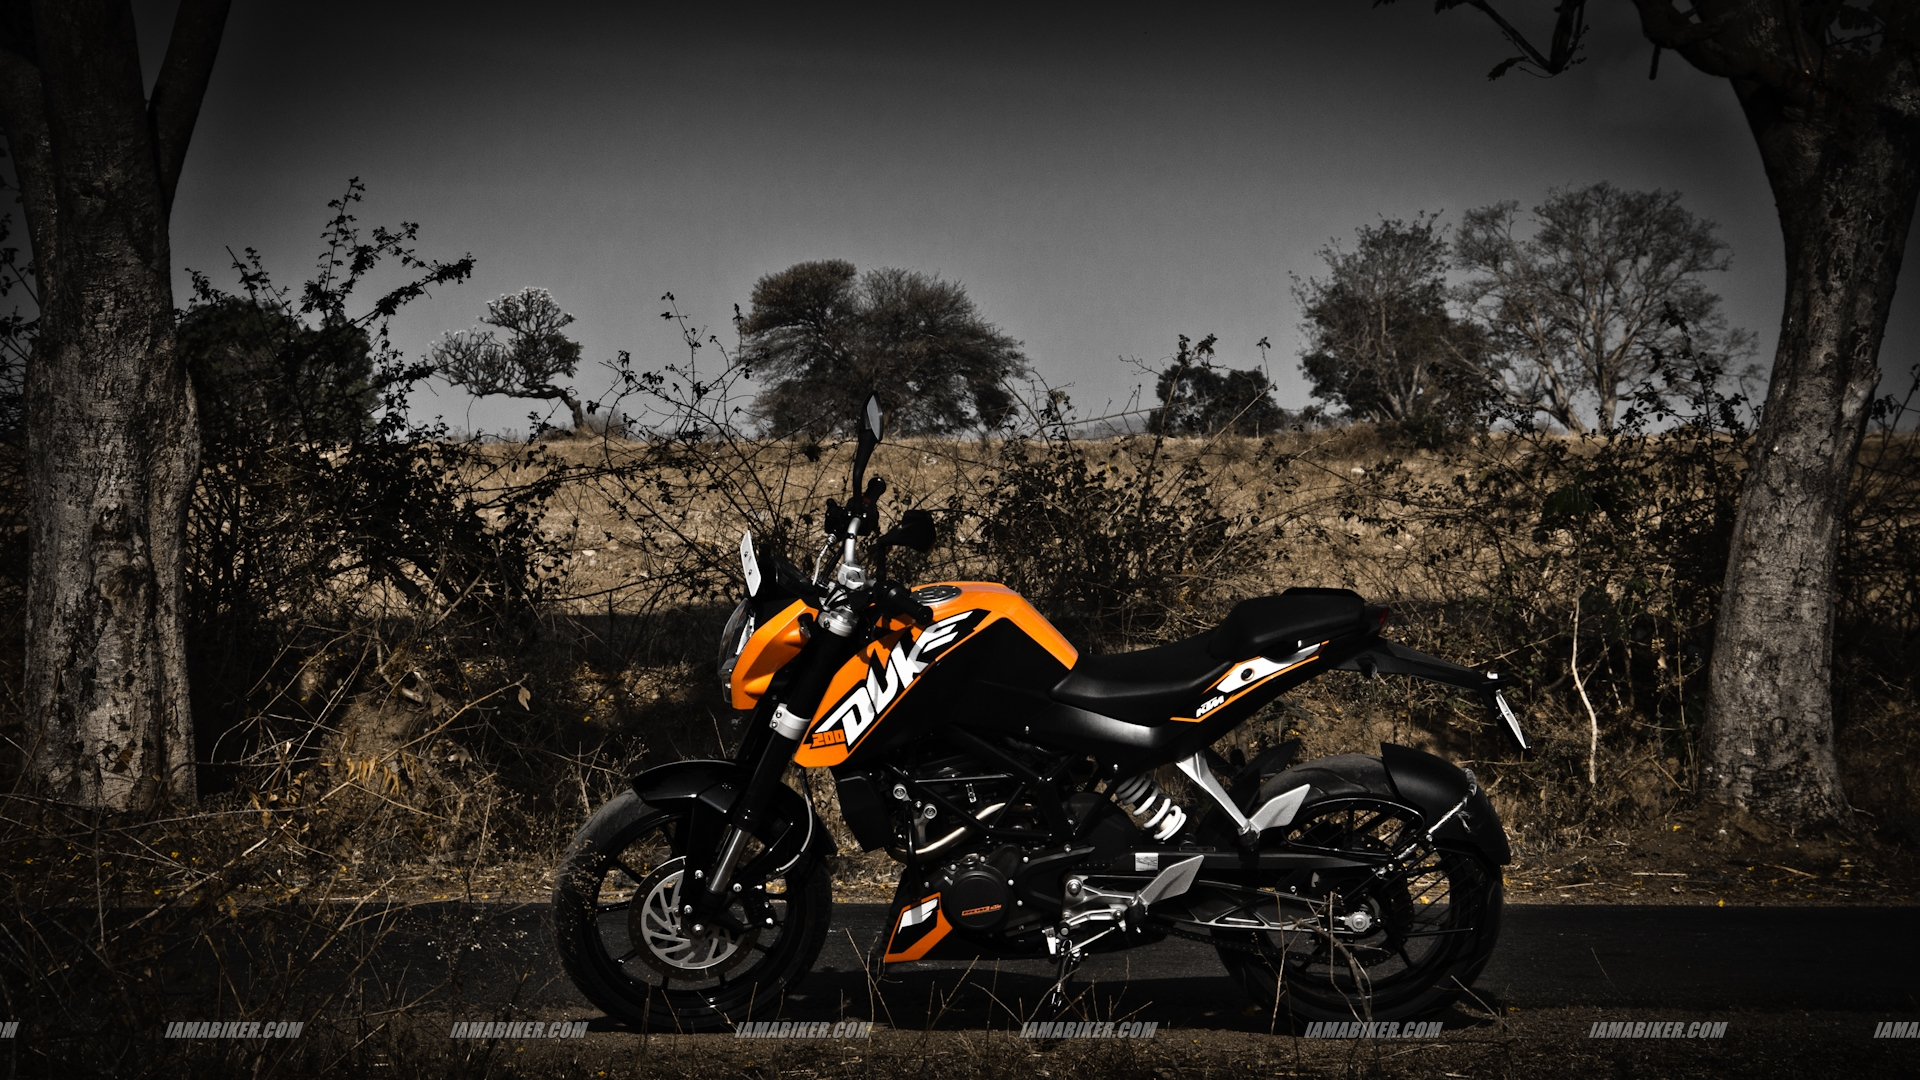 Ktm rc 390 bike hd photoshop